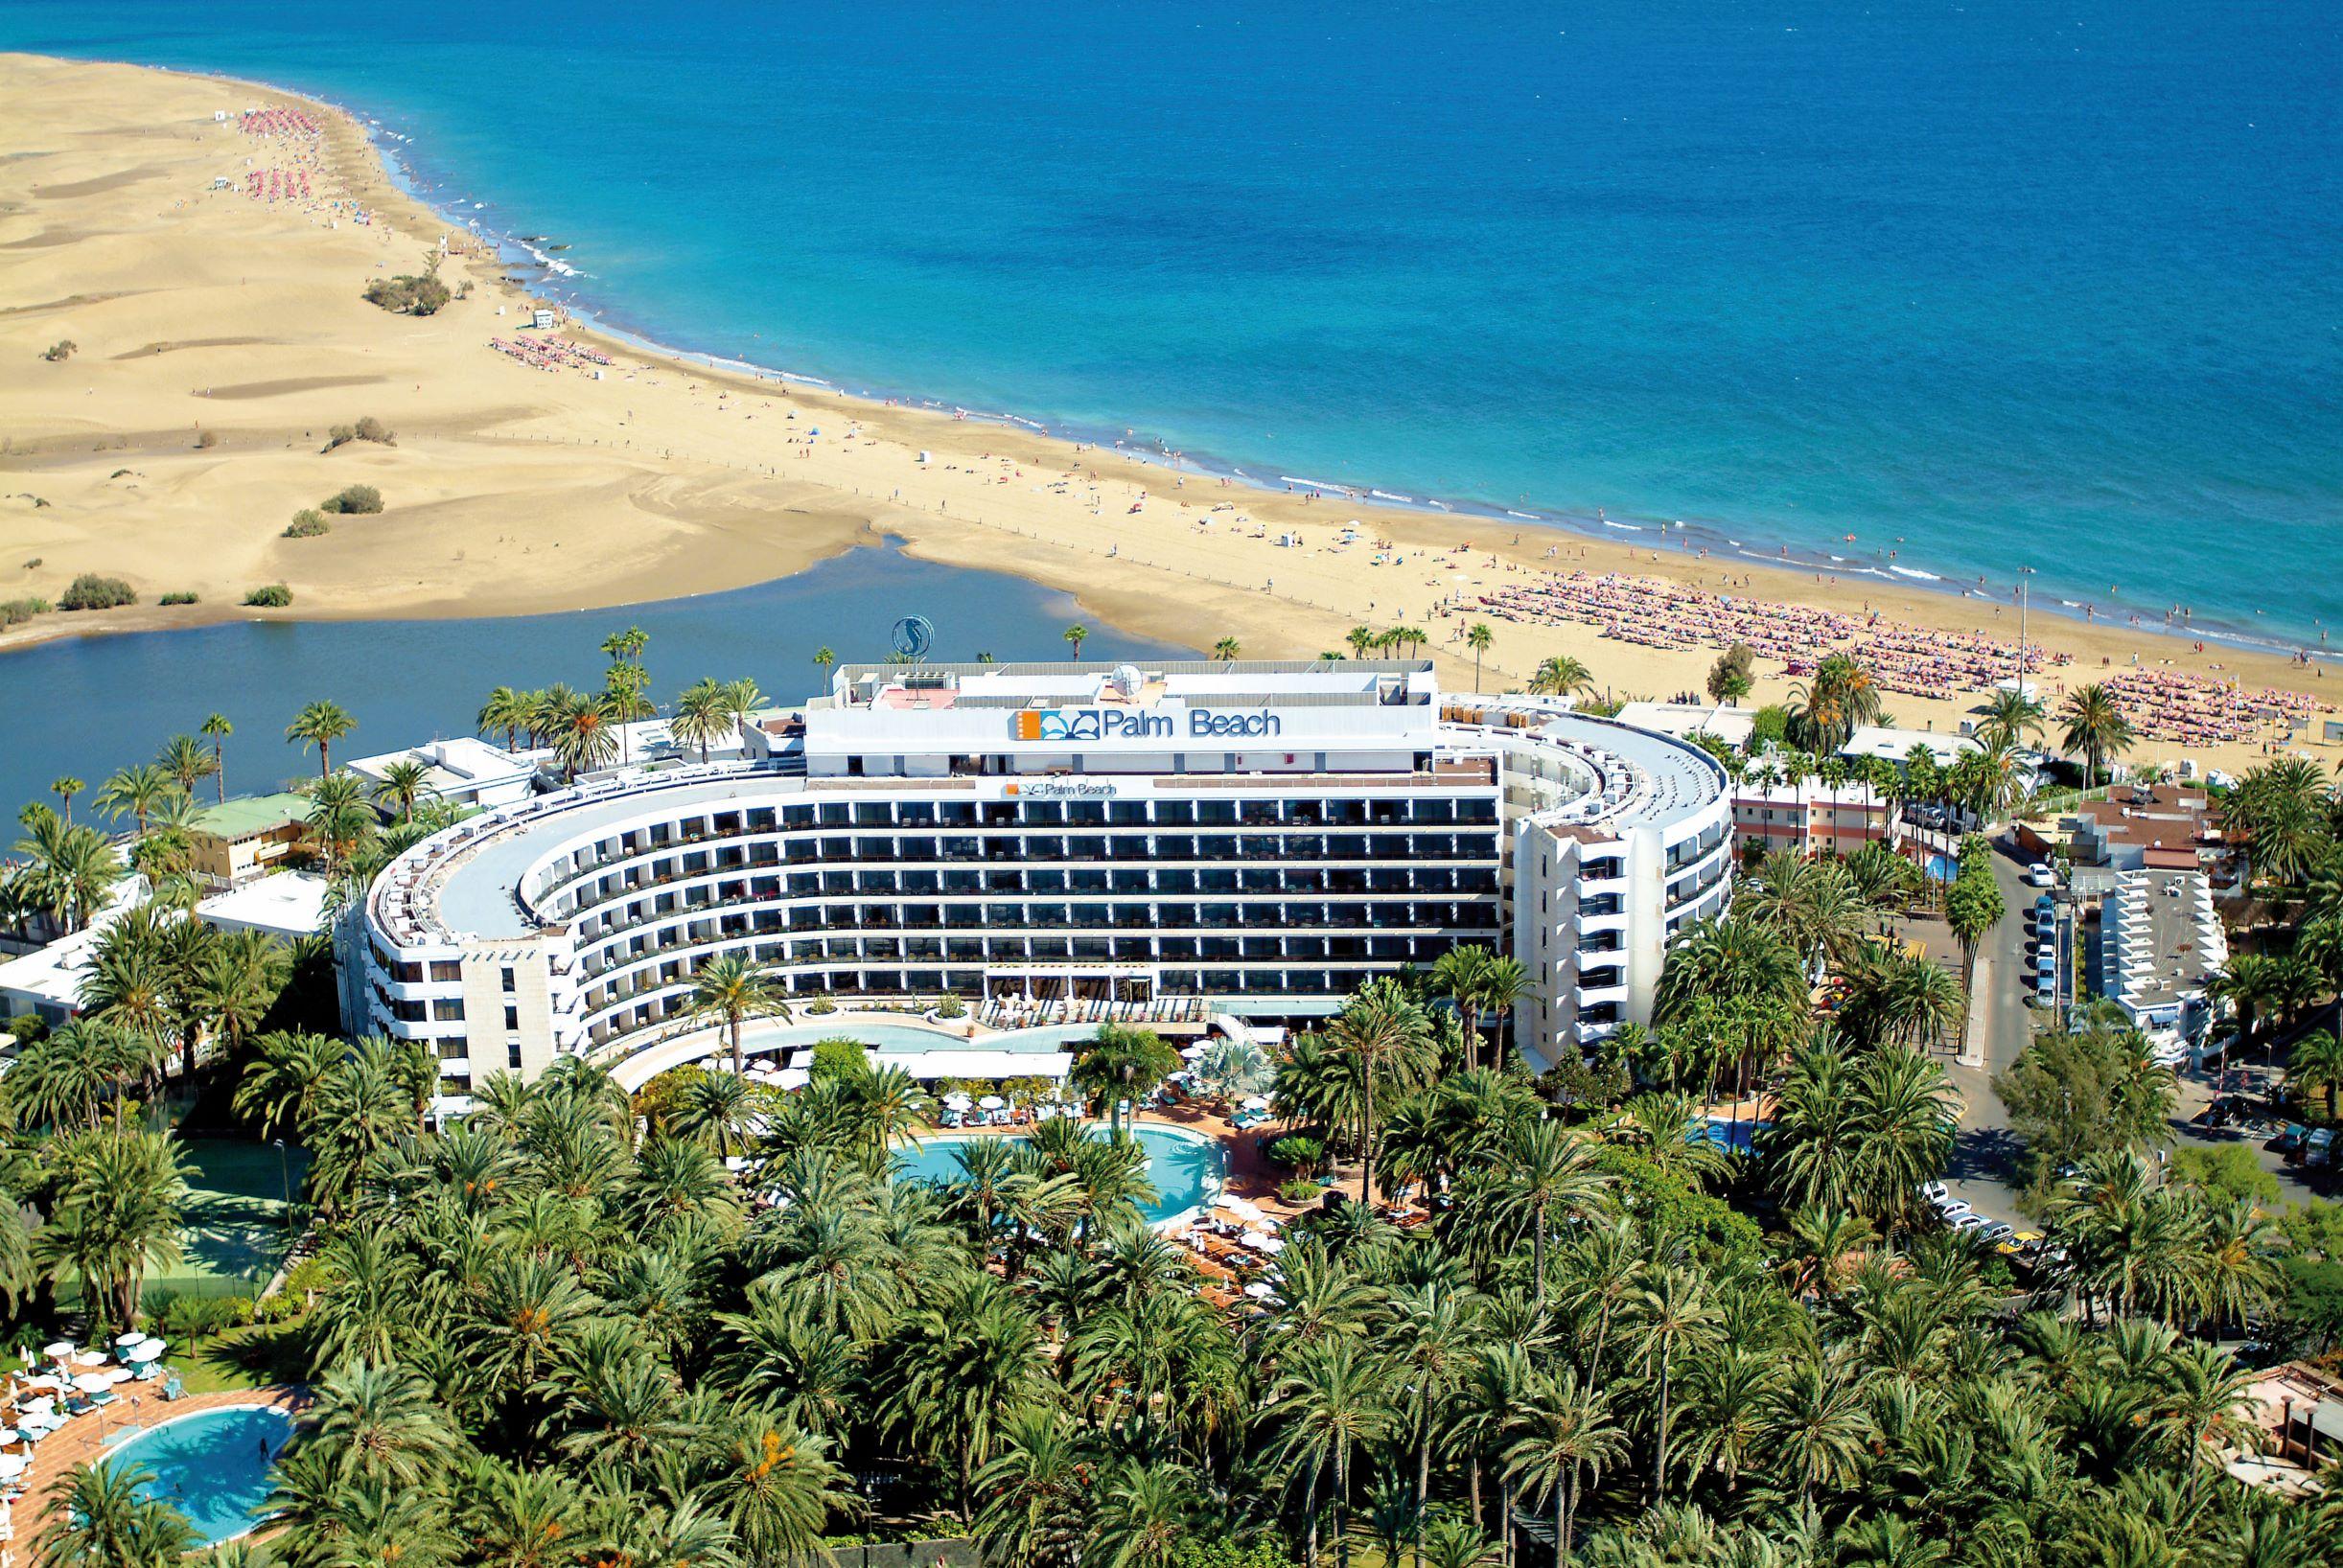 Seaside Palm Beach Maspalomas, Gran Canaria / CanariasNoticias.es